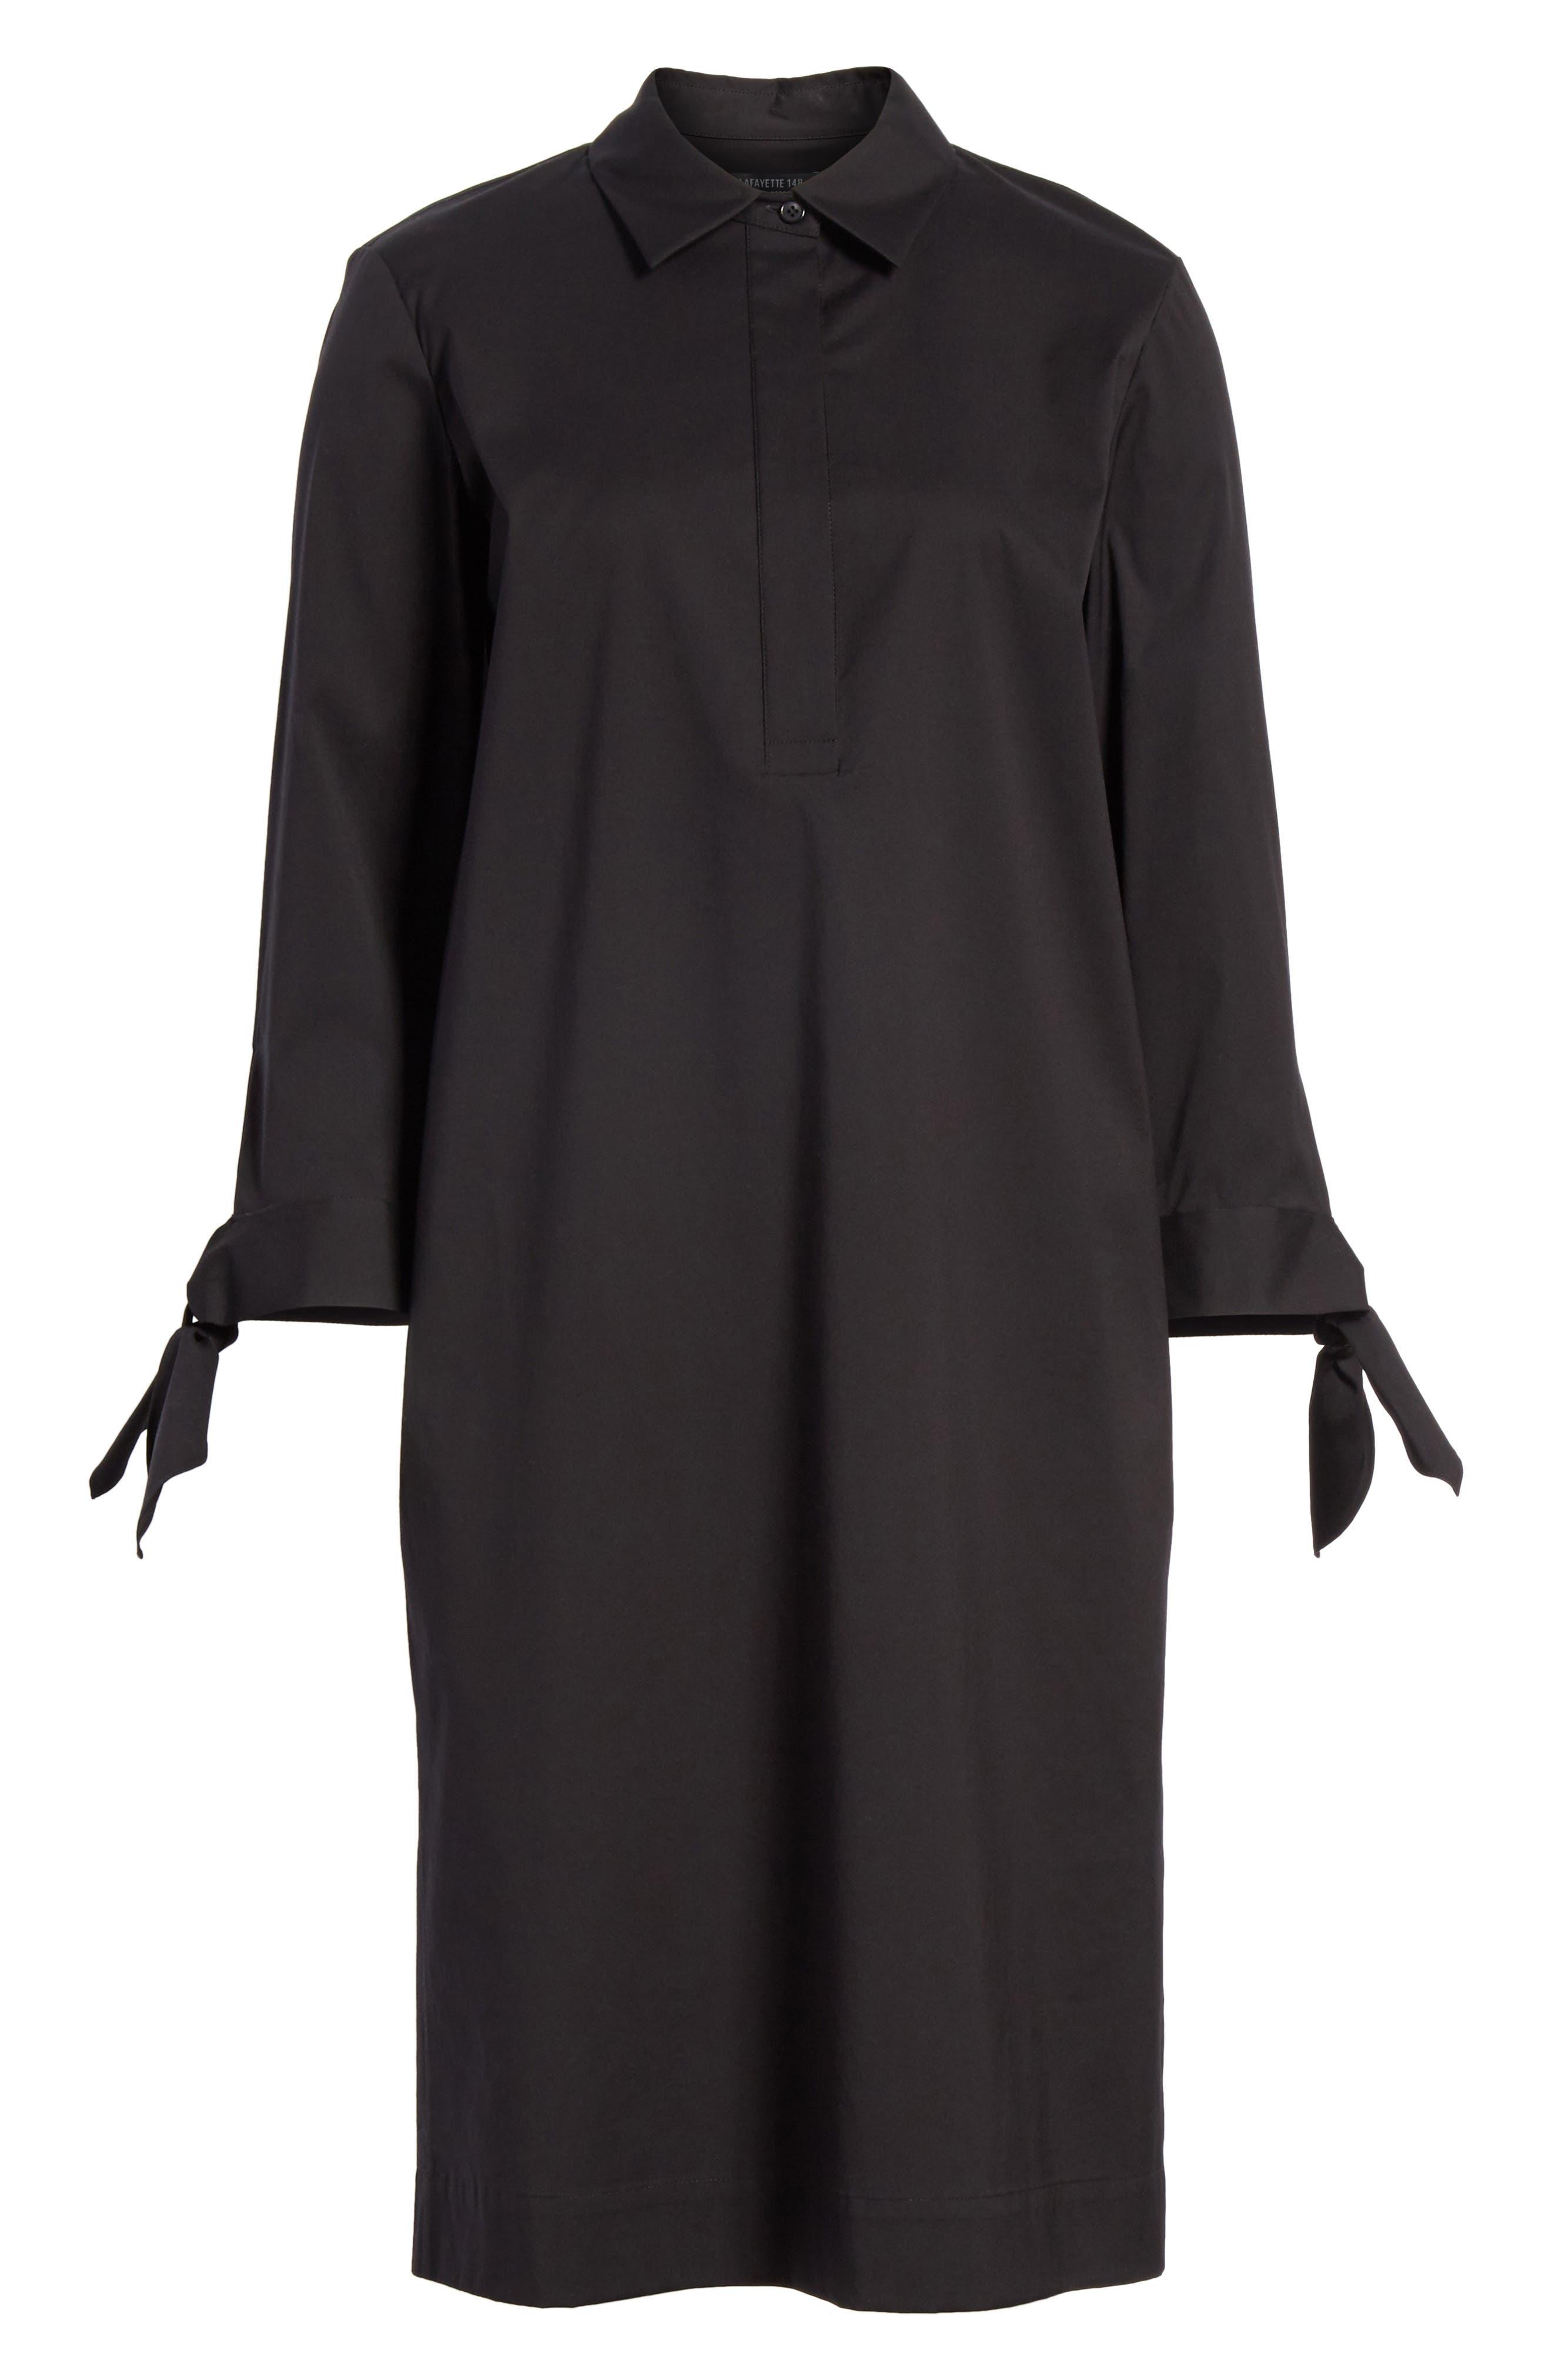 Talia Stretch Cotton Blend Dress,                             Alternate thumbnail 7, color,                             BLACK